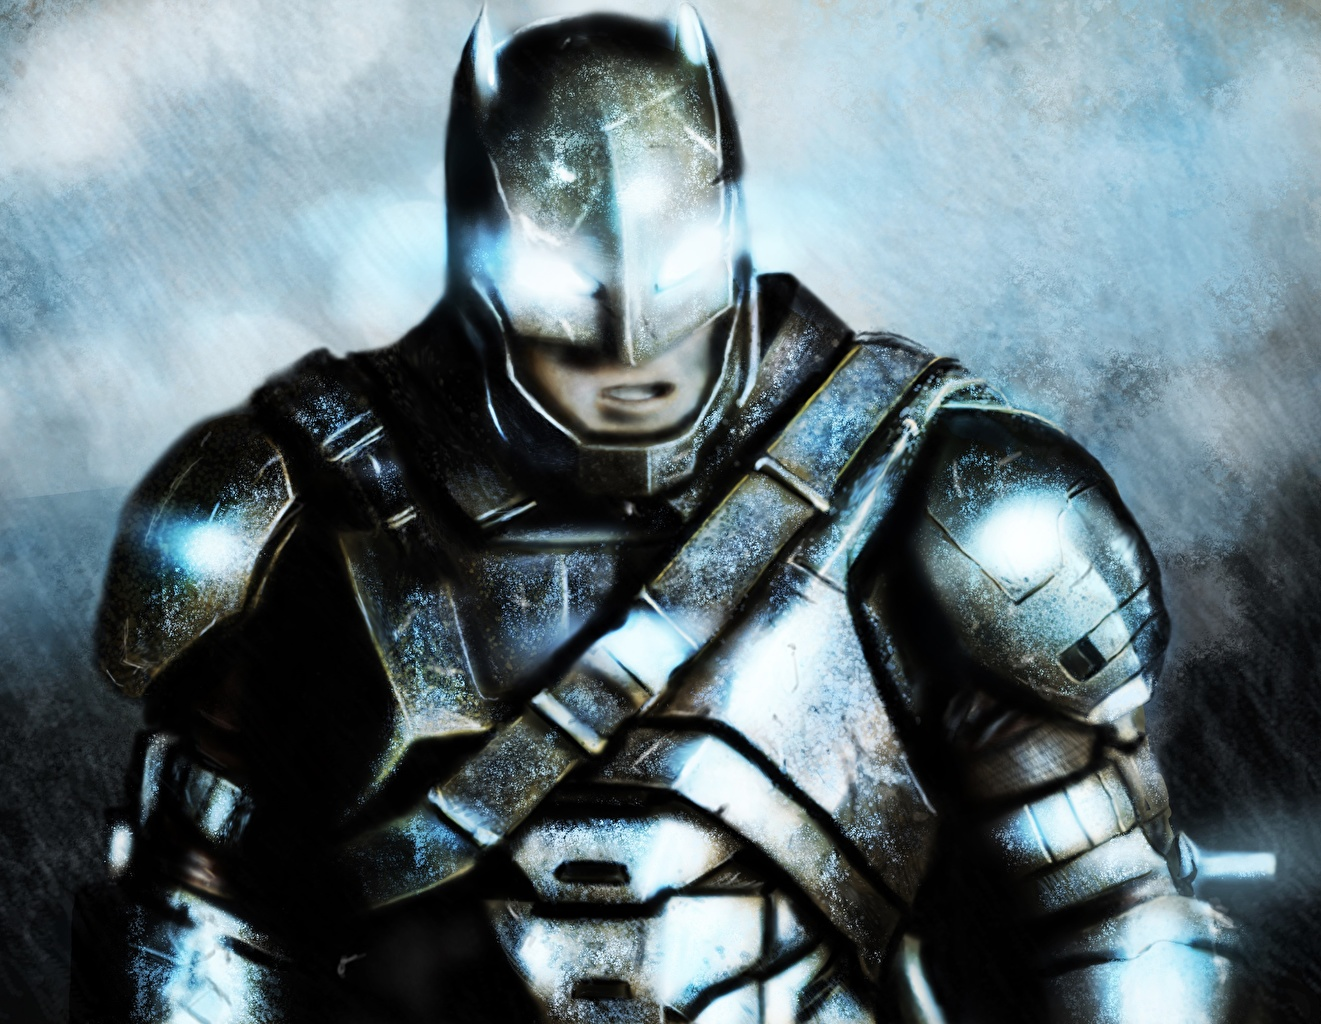 Images Batman v Superman: Dawn of Justice Armor Heroes comics Batman hero film Painting Art armour superheroes Movies